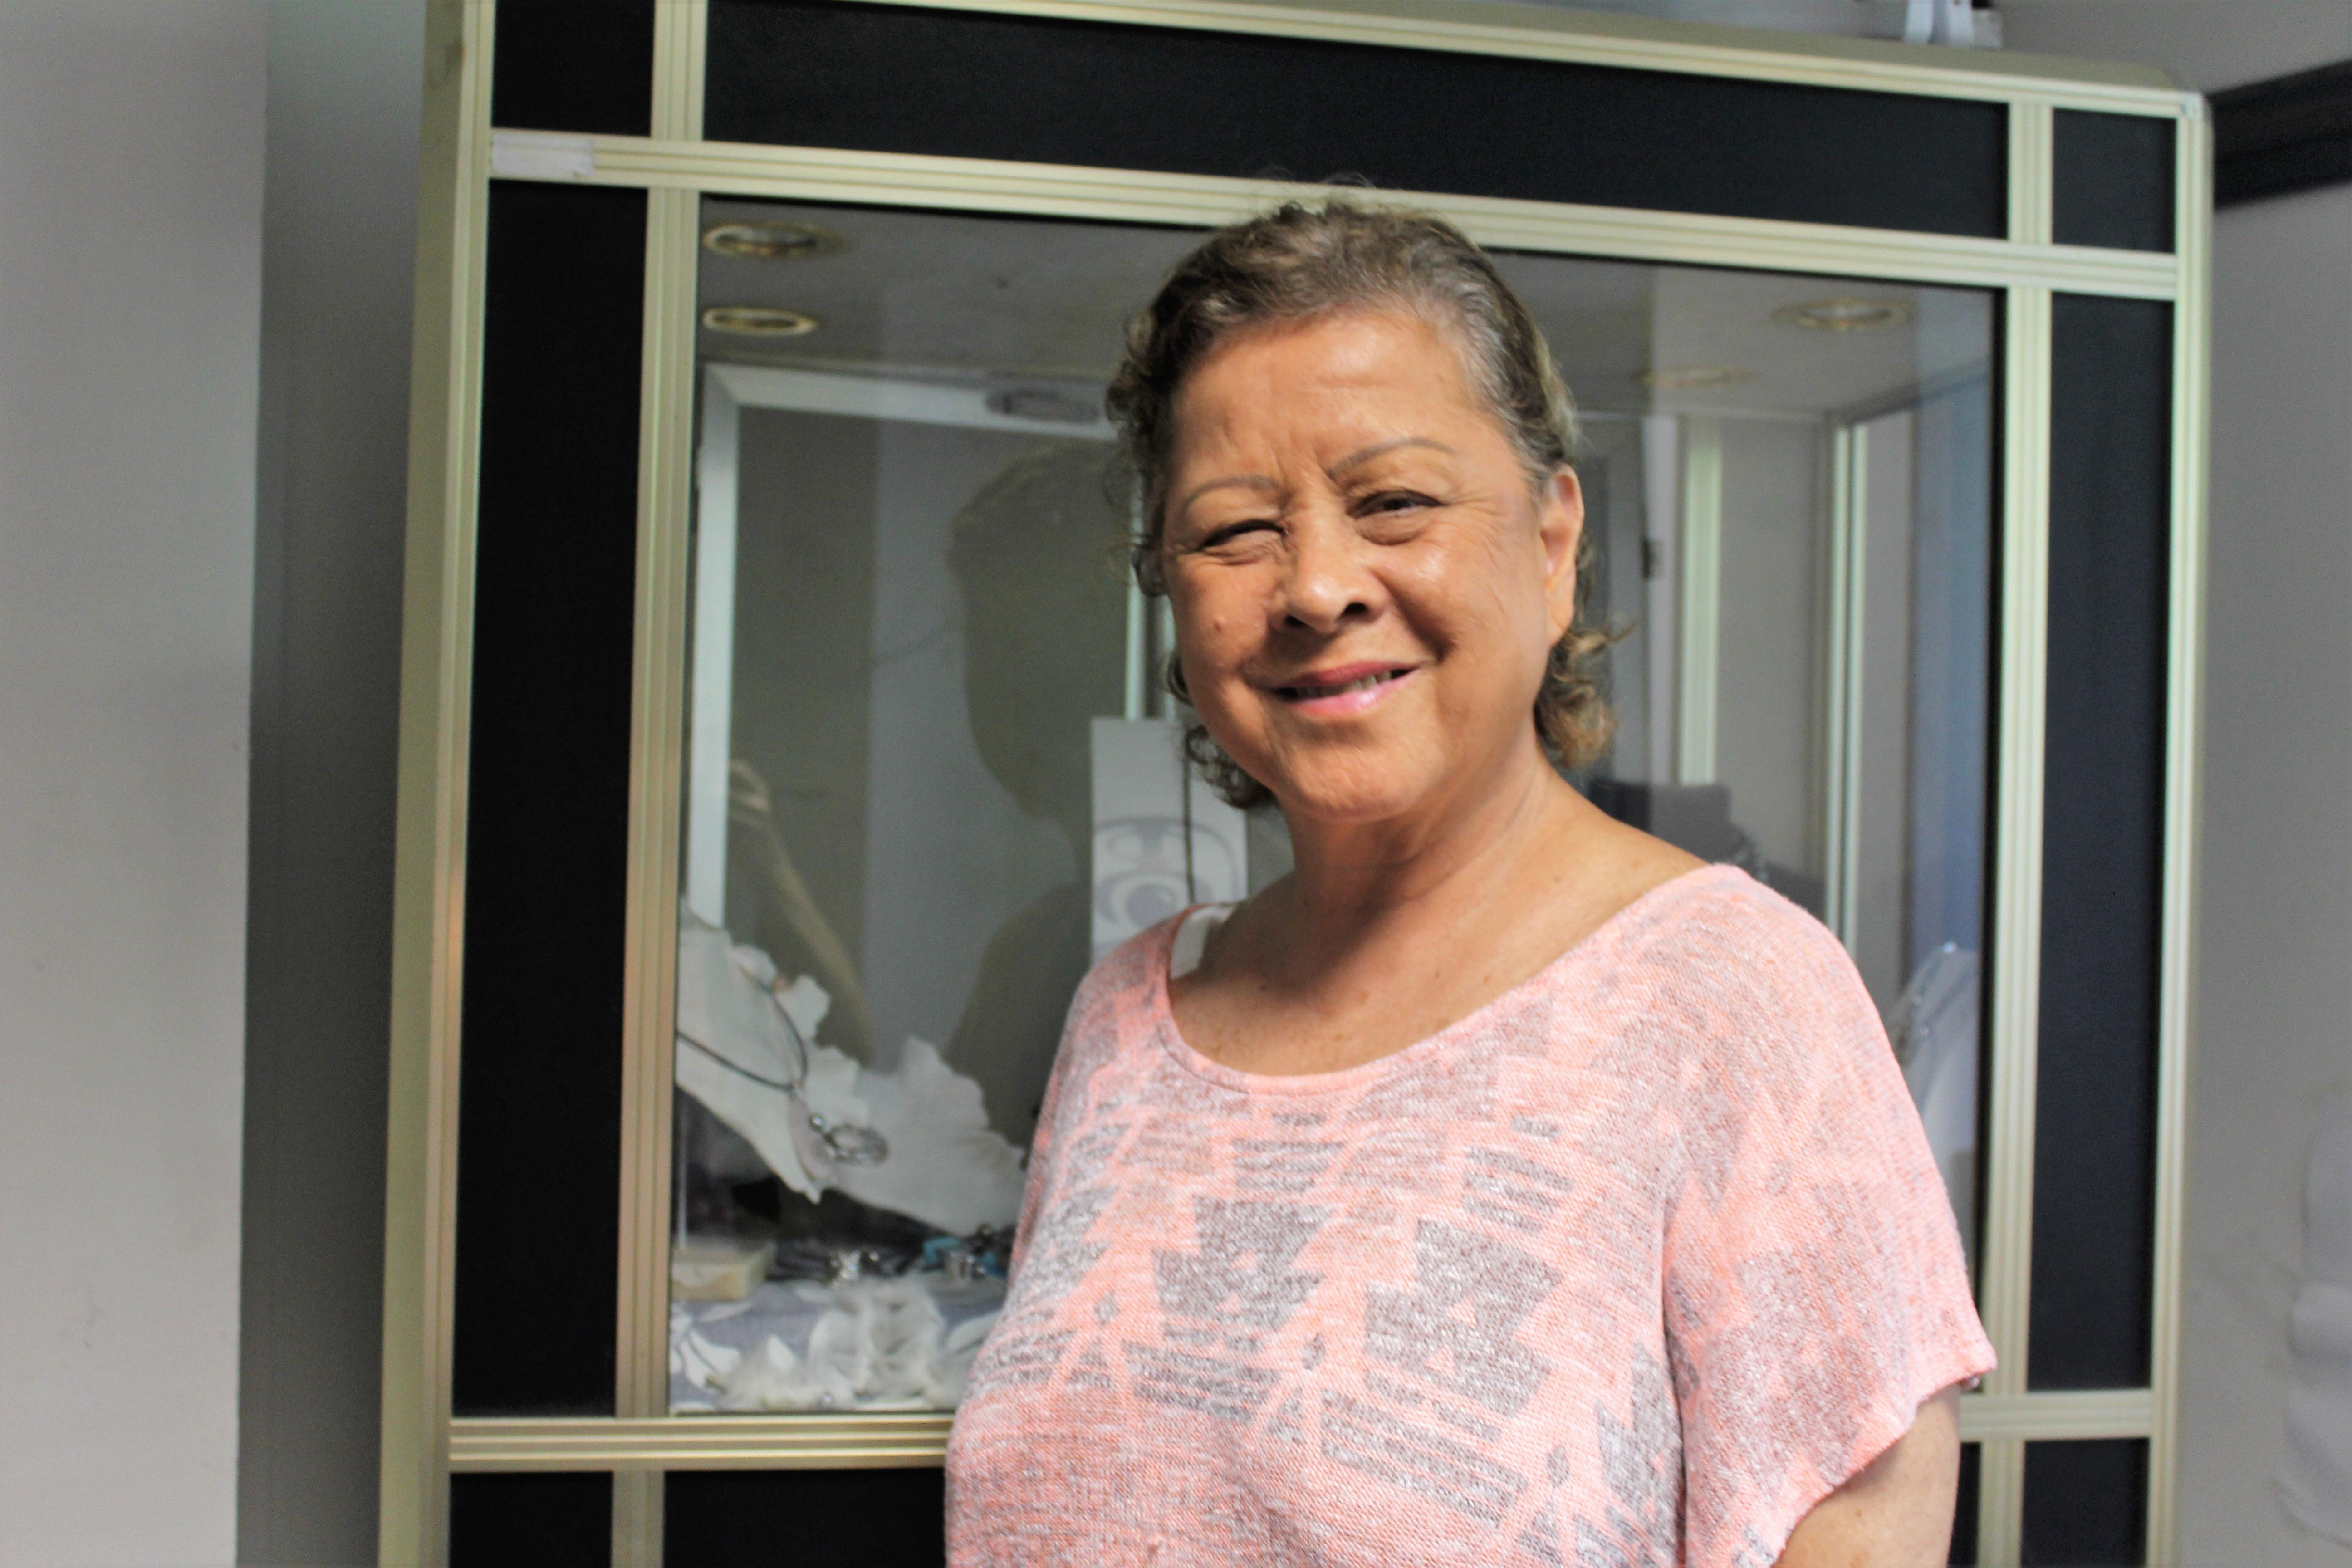 Aline ladassari est présidente de la Tahitian Pearl Association of French Polynesia.